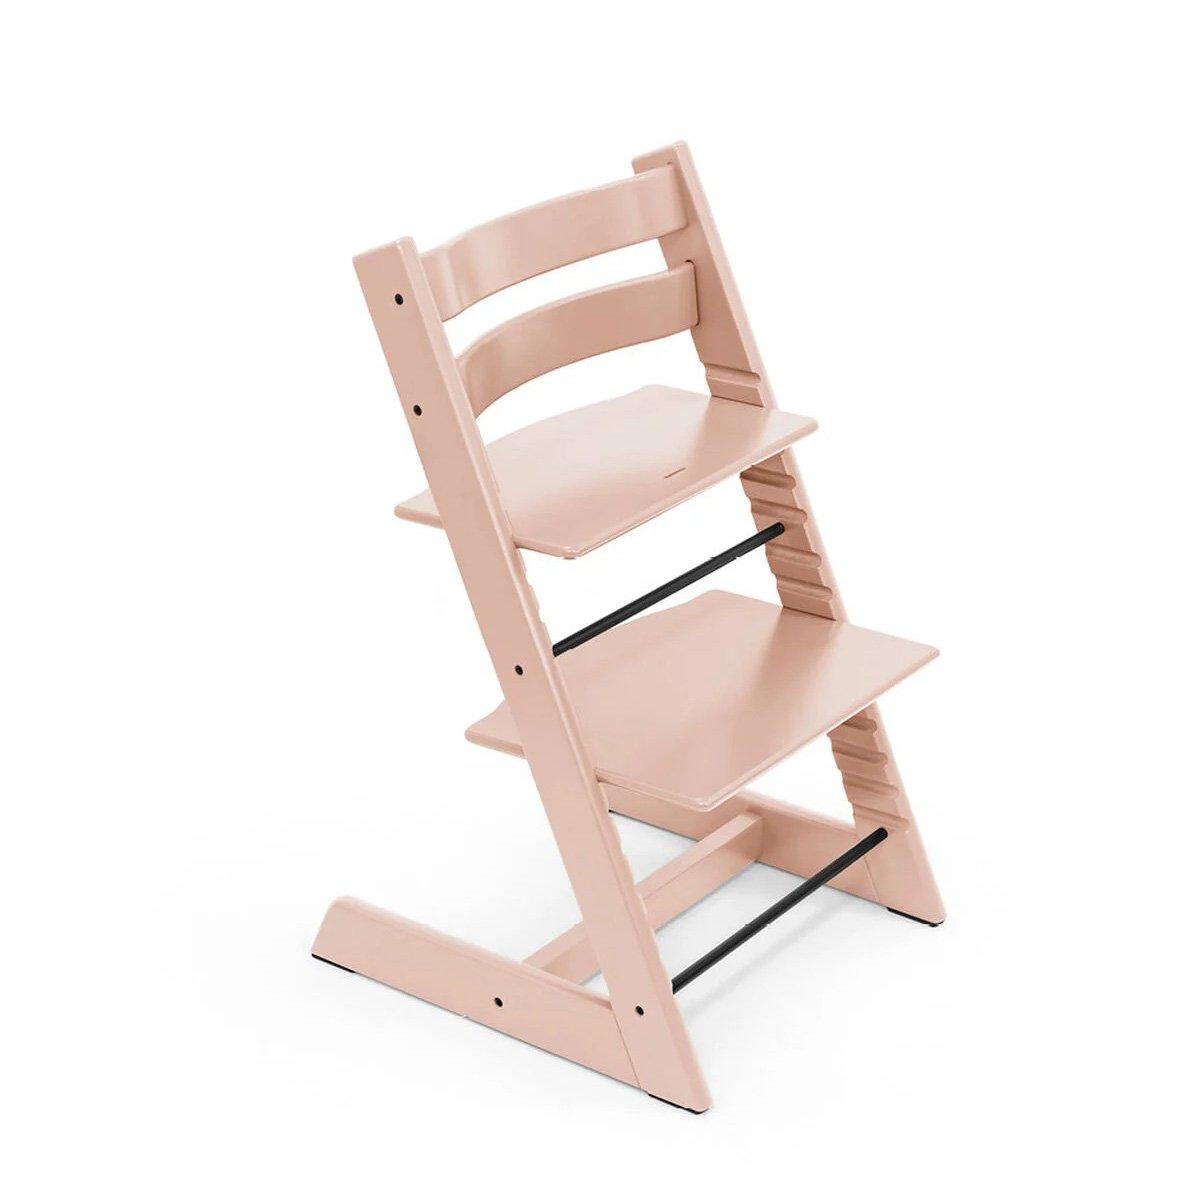 Chaise haute Tripp Trapp ROSE Stokke